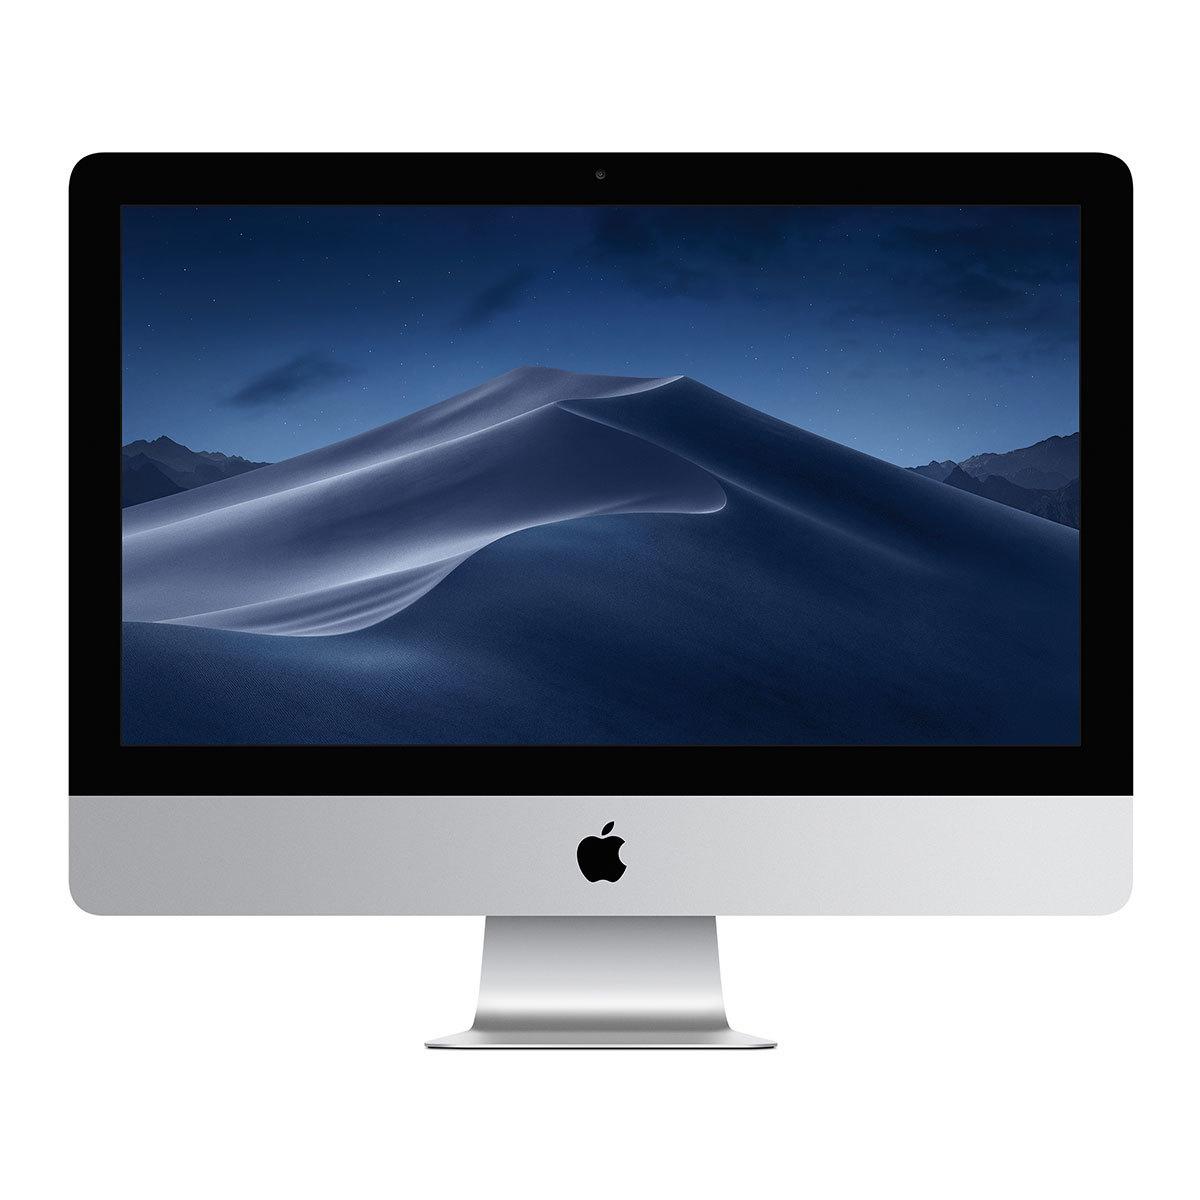 "Costco: Apple iMac 21.5"" - Intel Core i5 - 1TB 10% de bonificacion y hasta 12 meses con banamex"